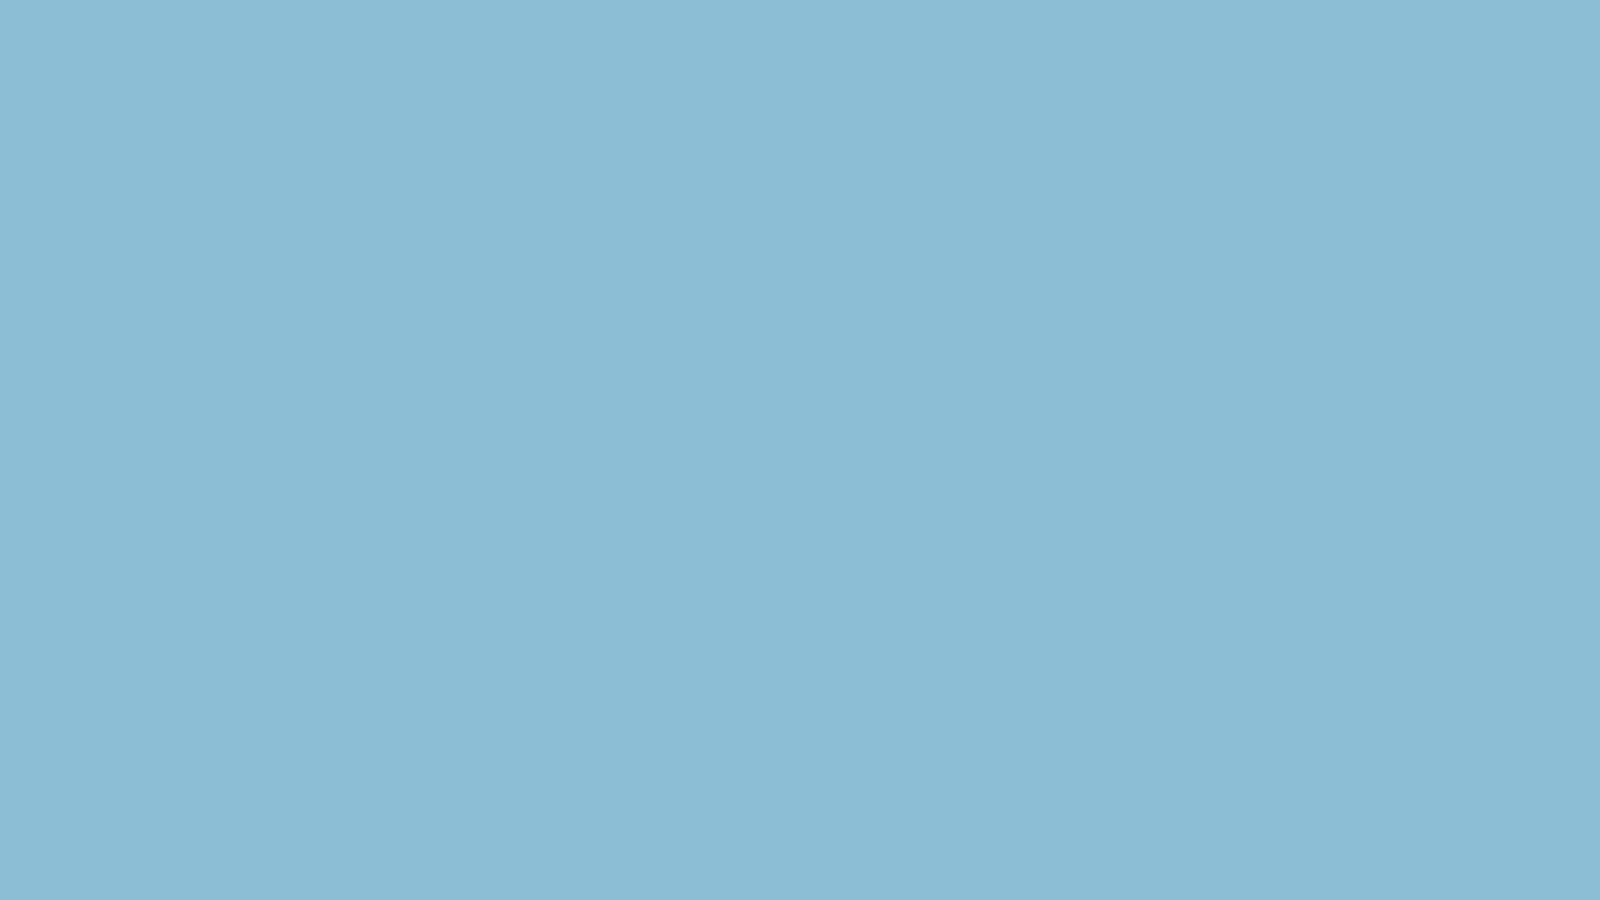 1600x900 Dark Sky Blue Solid Color Background